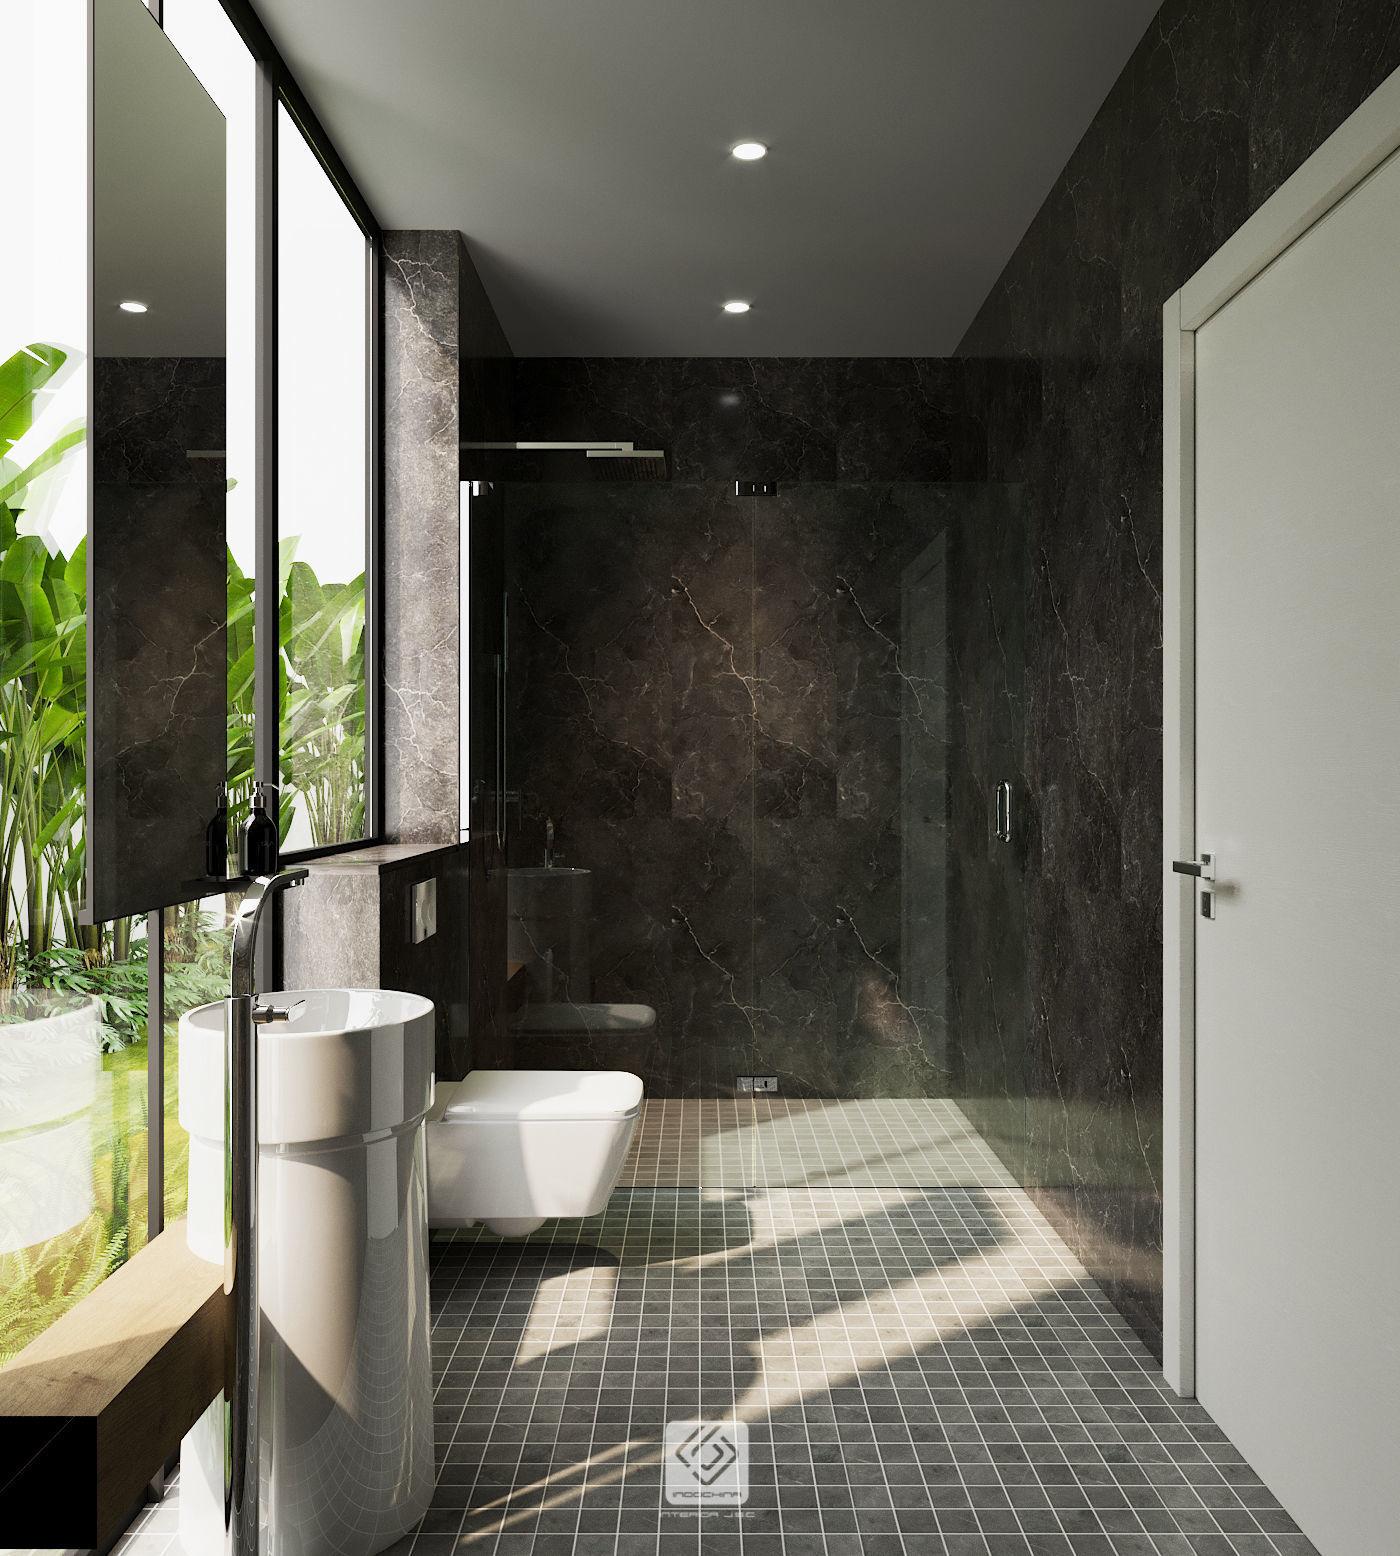 3D Bathroom modern tropical | CGTrader on Model Bathroom  id=22622